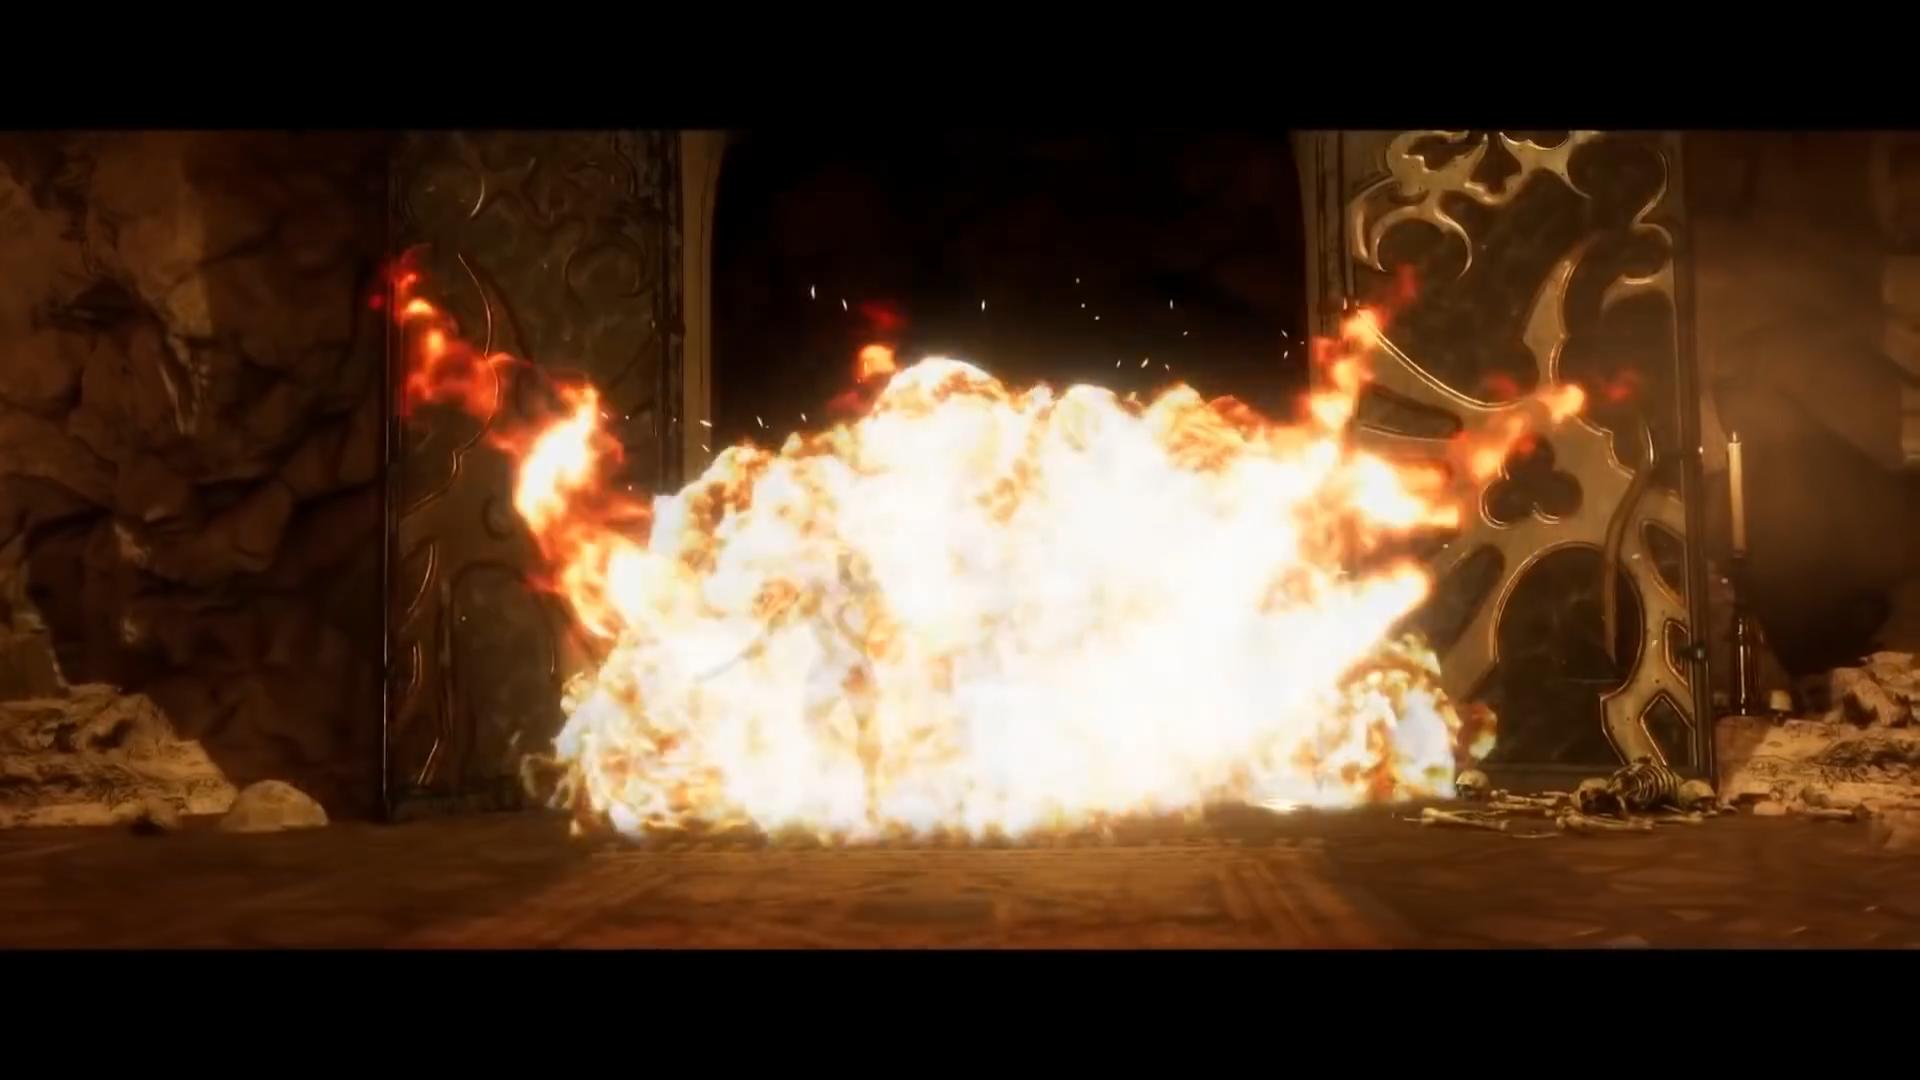 IMG_20190121_193610.892.jpg - Mortal Kombat 11